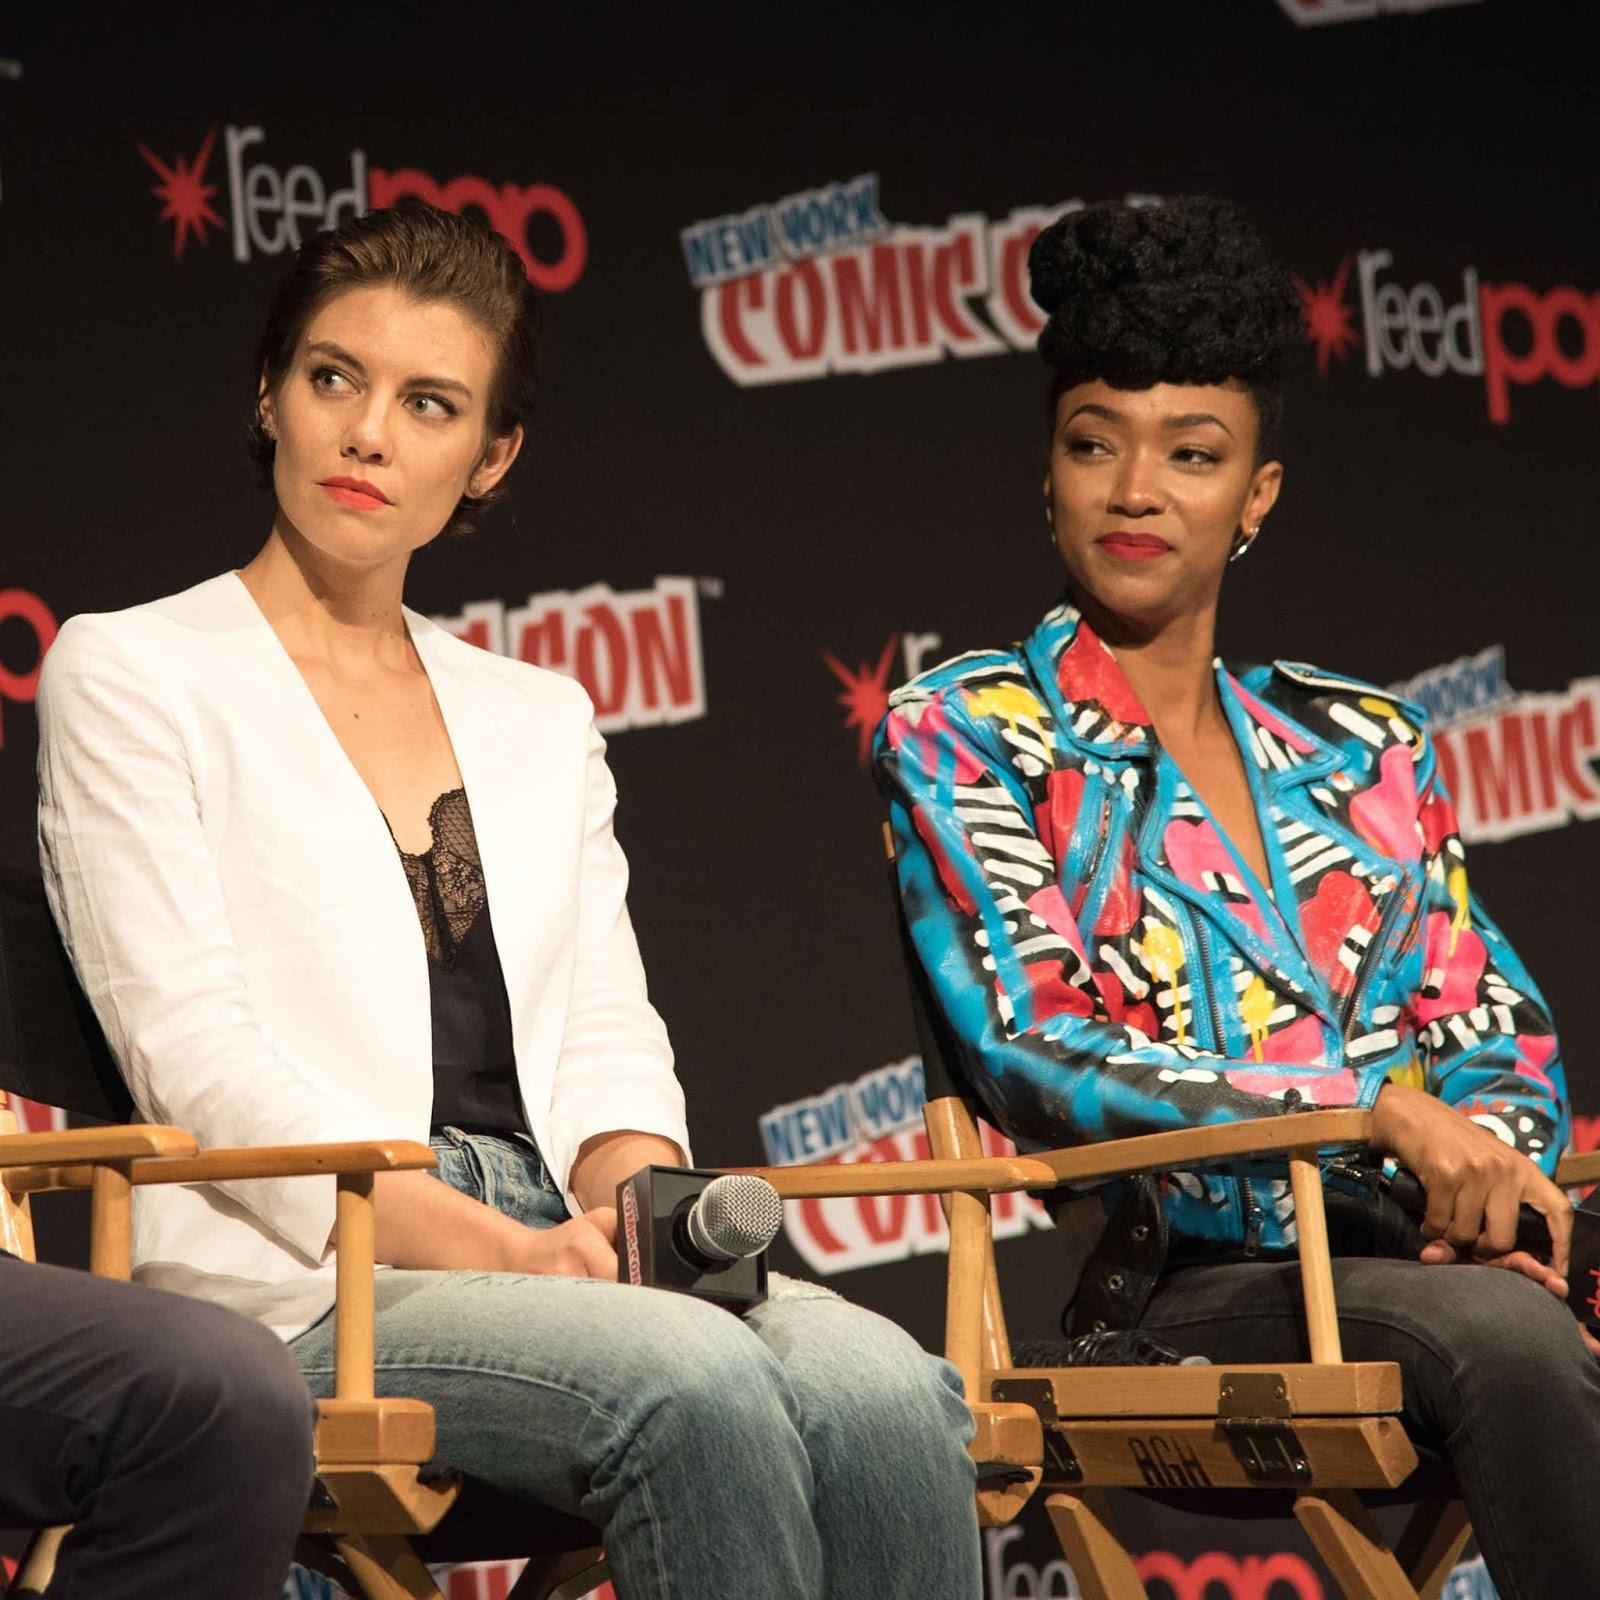 Lauren Cohan and Sonequa Martin-Green at New York Comic Con